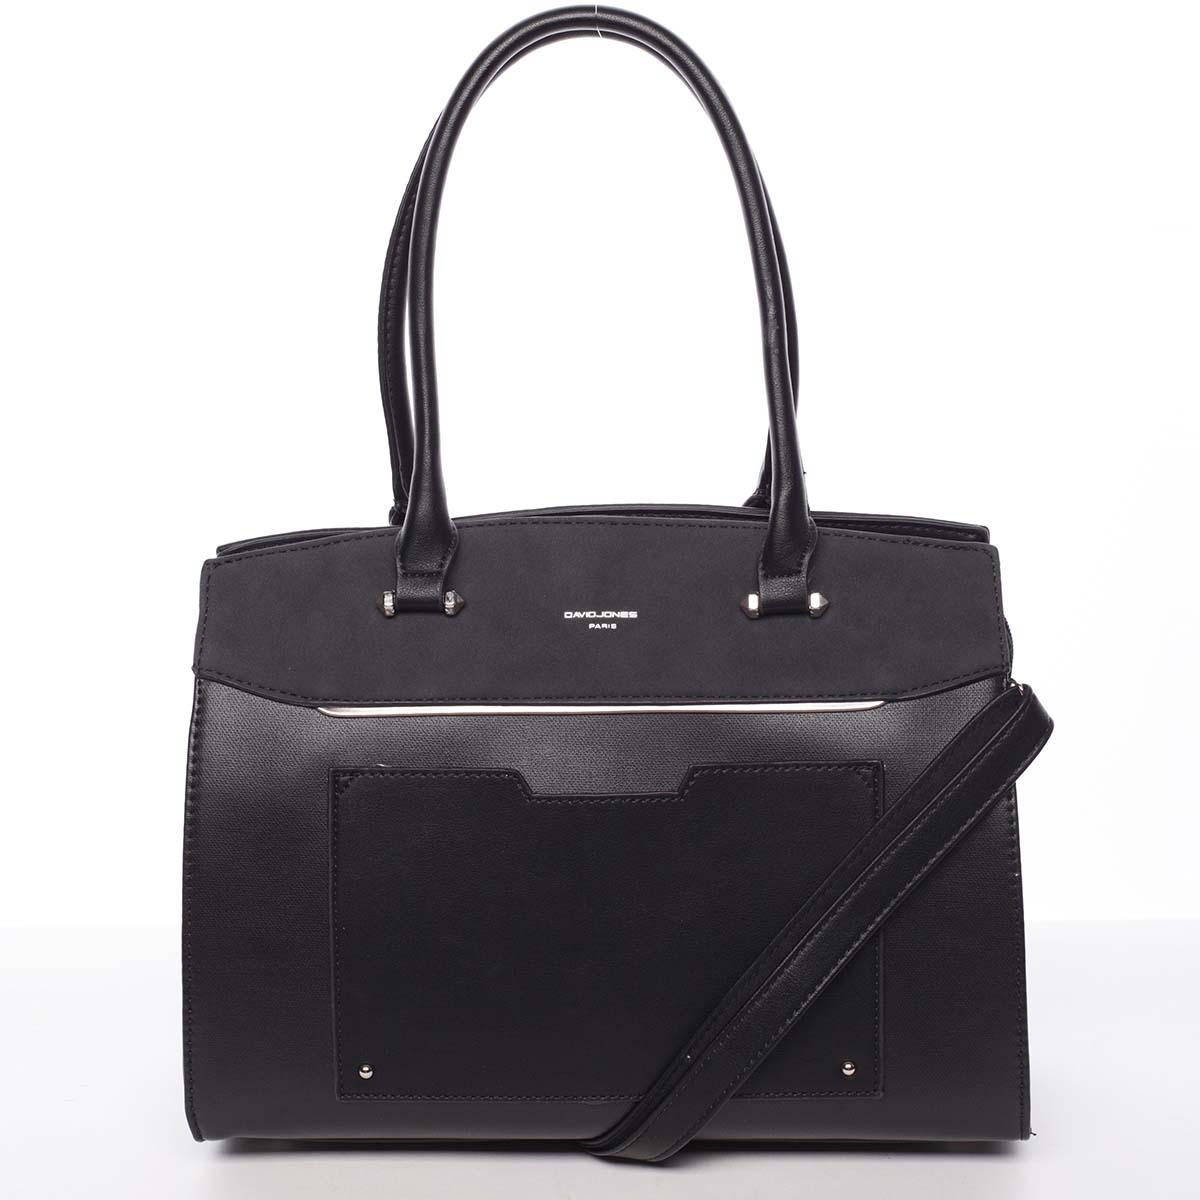 Jedinečná dámska čierna kabelka - David Jones Hazel čierna